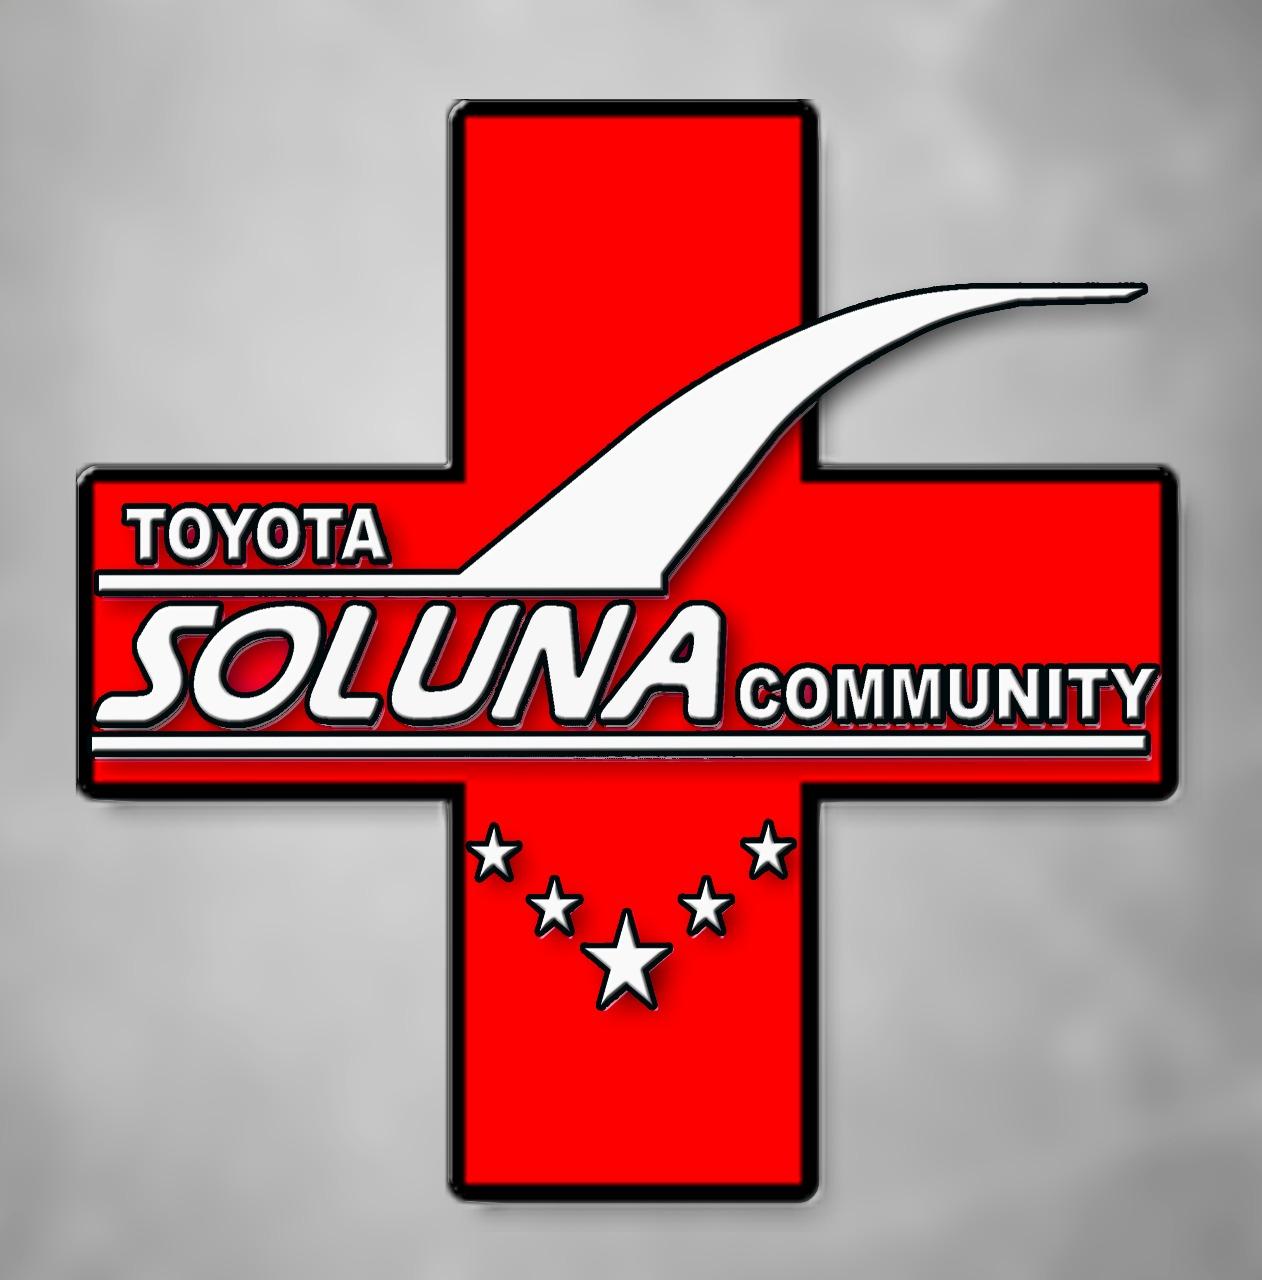 Toyota Soluna Community (TSC) Semakin Melebarkan Sayap Diberbagai Daerah di Indonesia